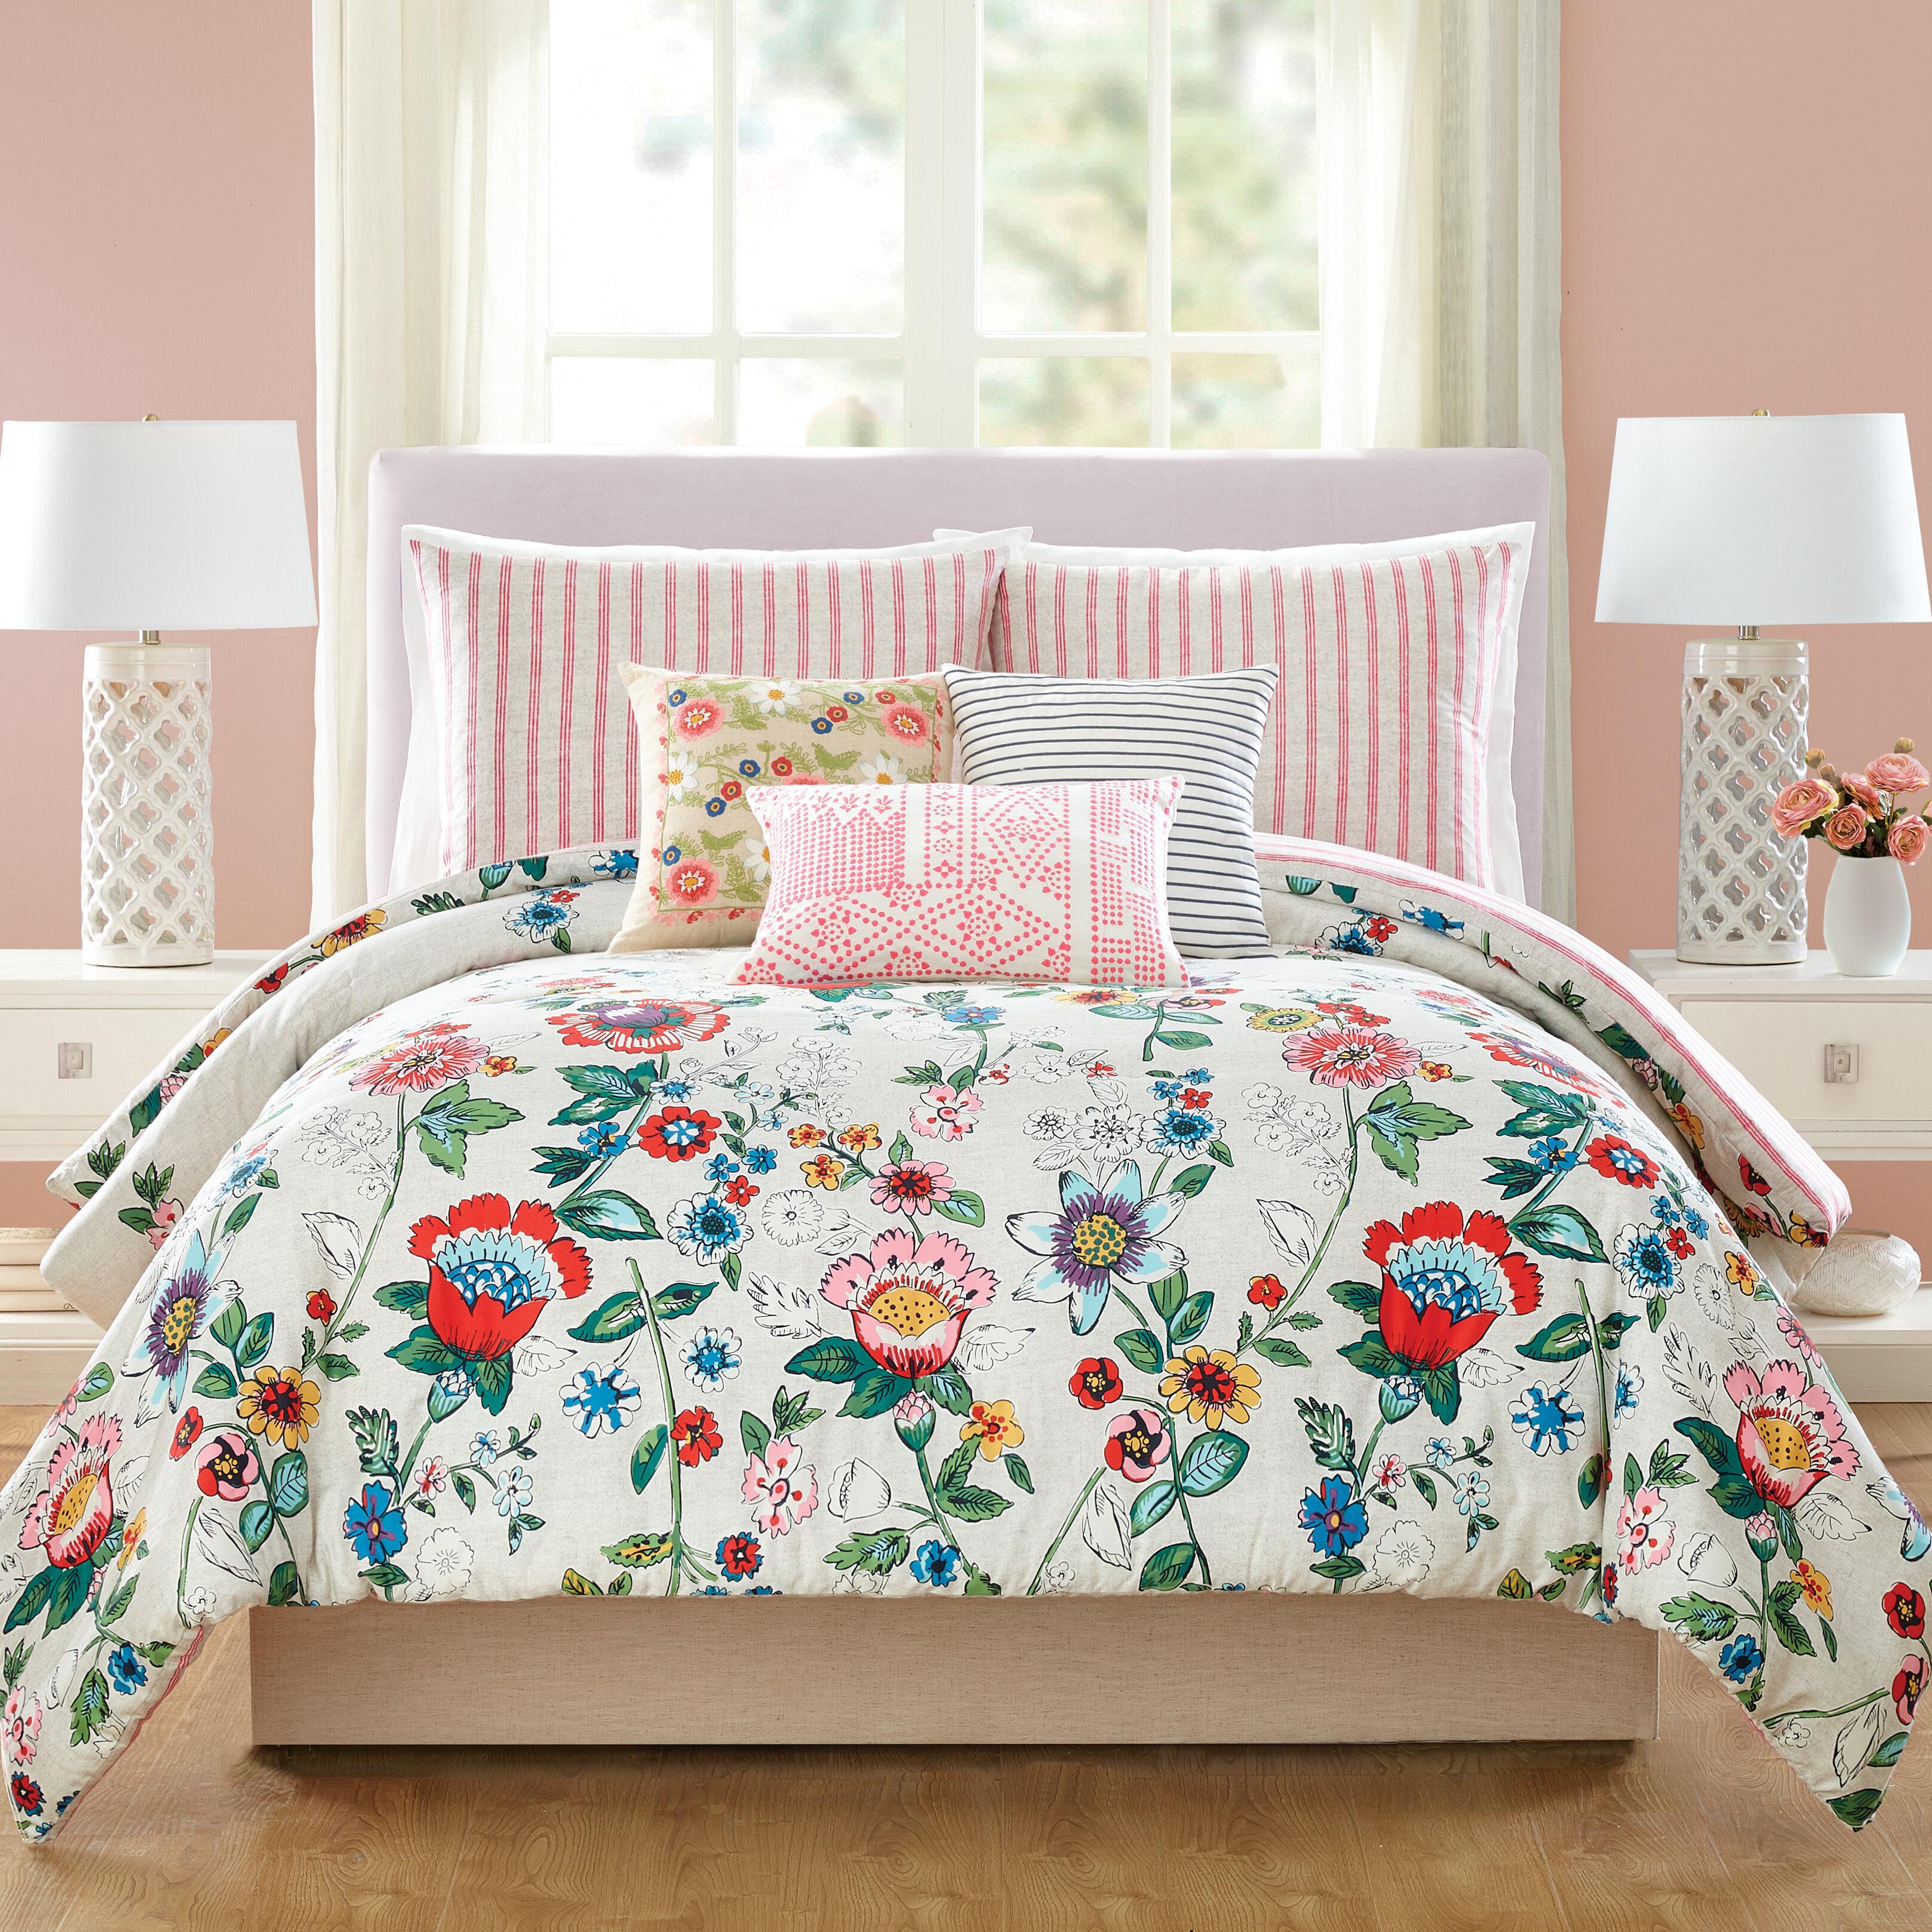 summer comforter for sets bedspread coral double mint bedding